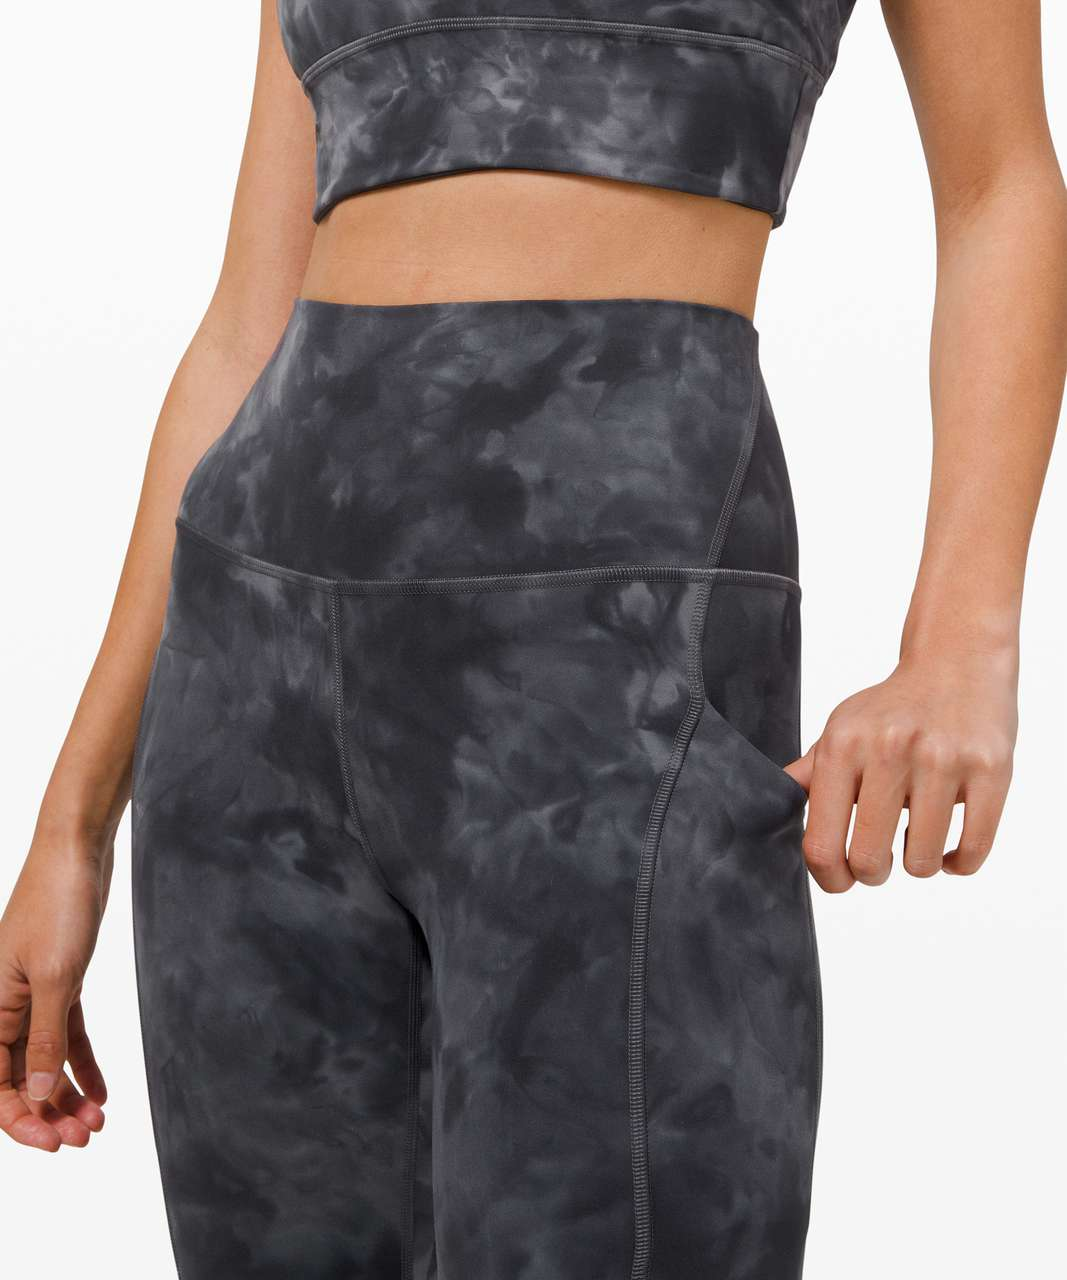 "Lululemon Align High Rise Crop with Pockets 23"" *Diamond Dye - Diamond Dye Pitch Grey Graphite Grey"